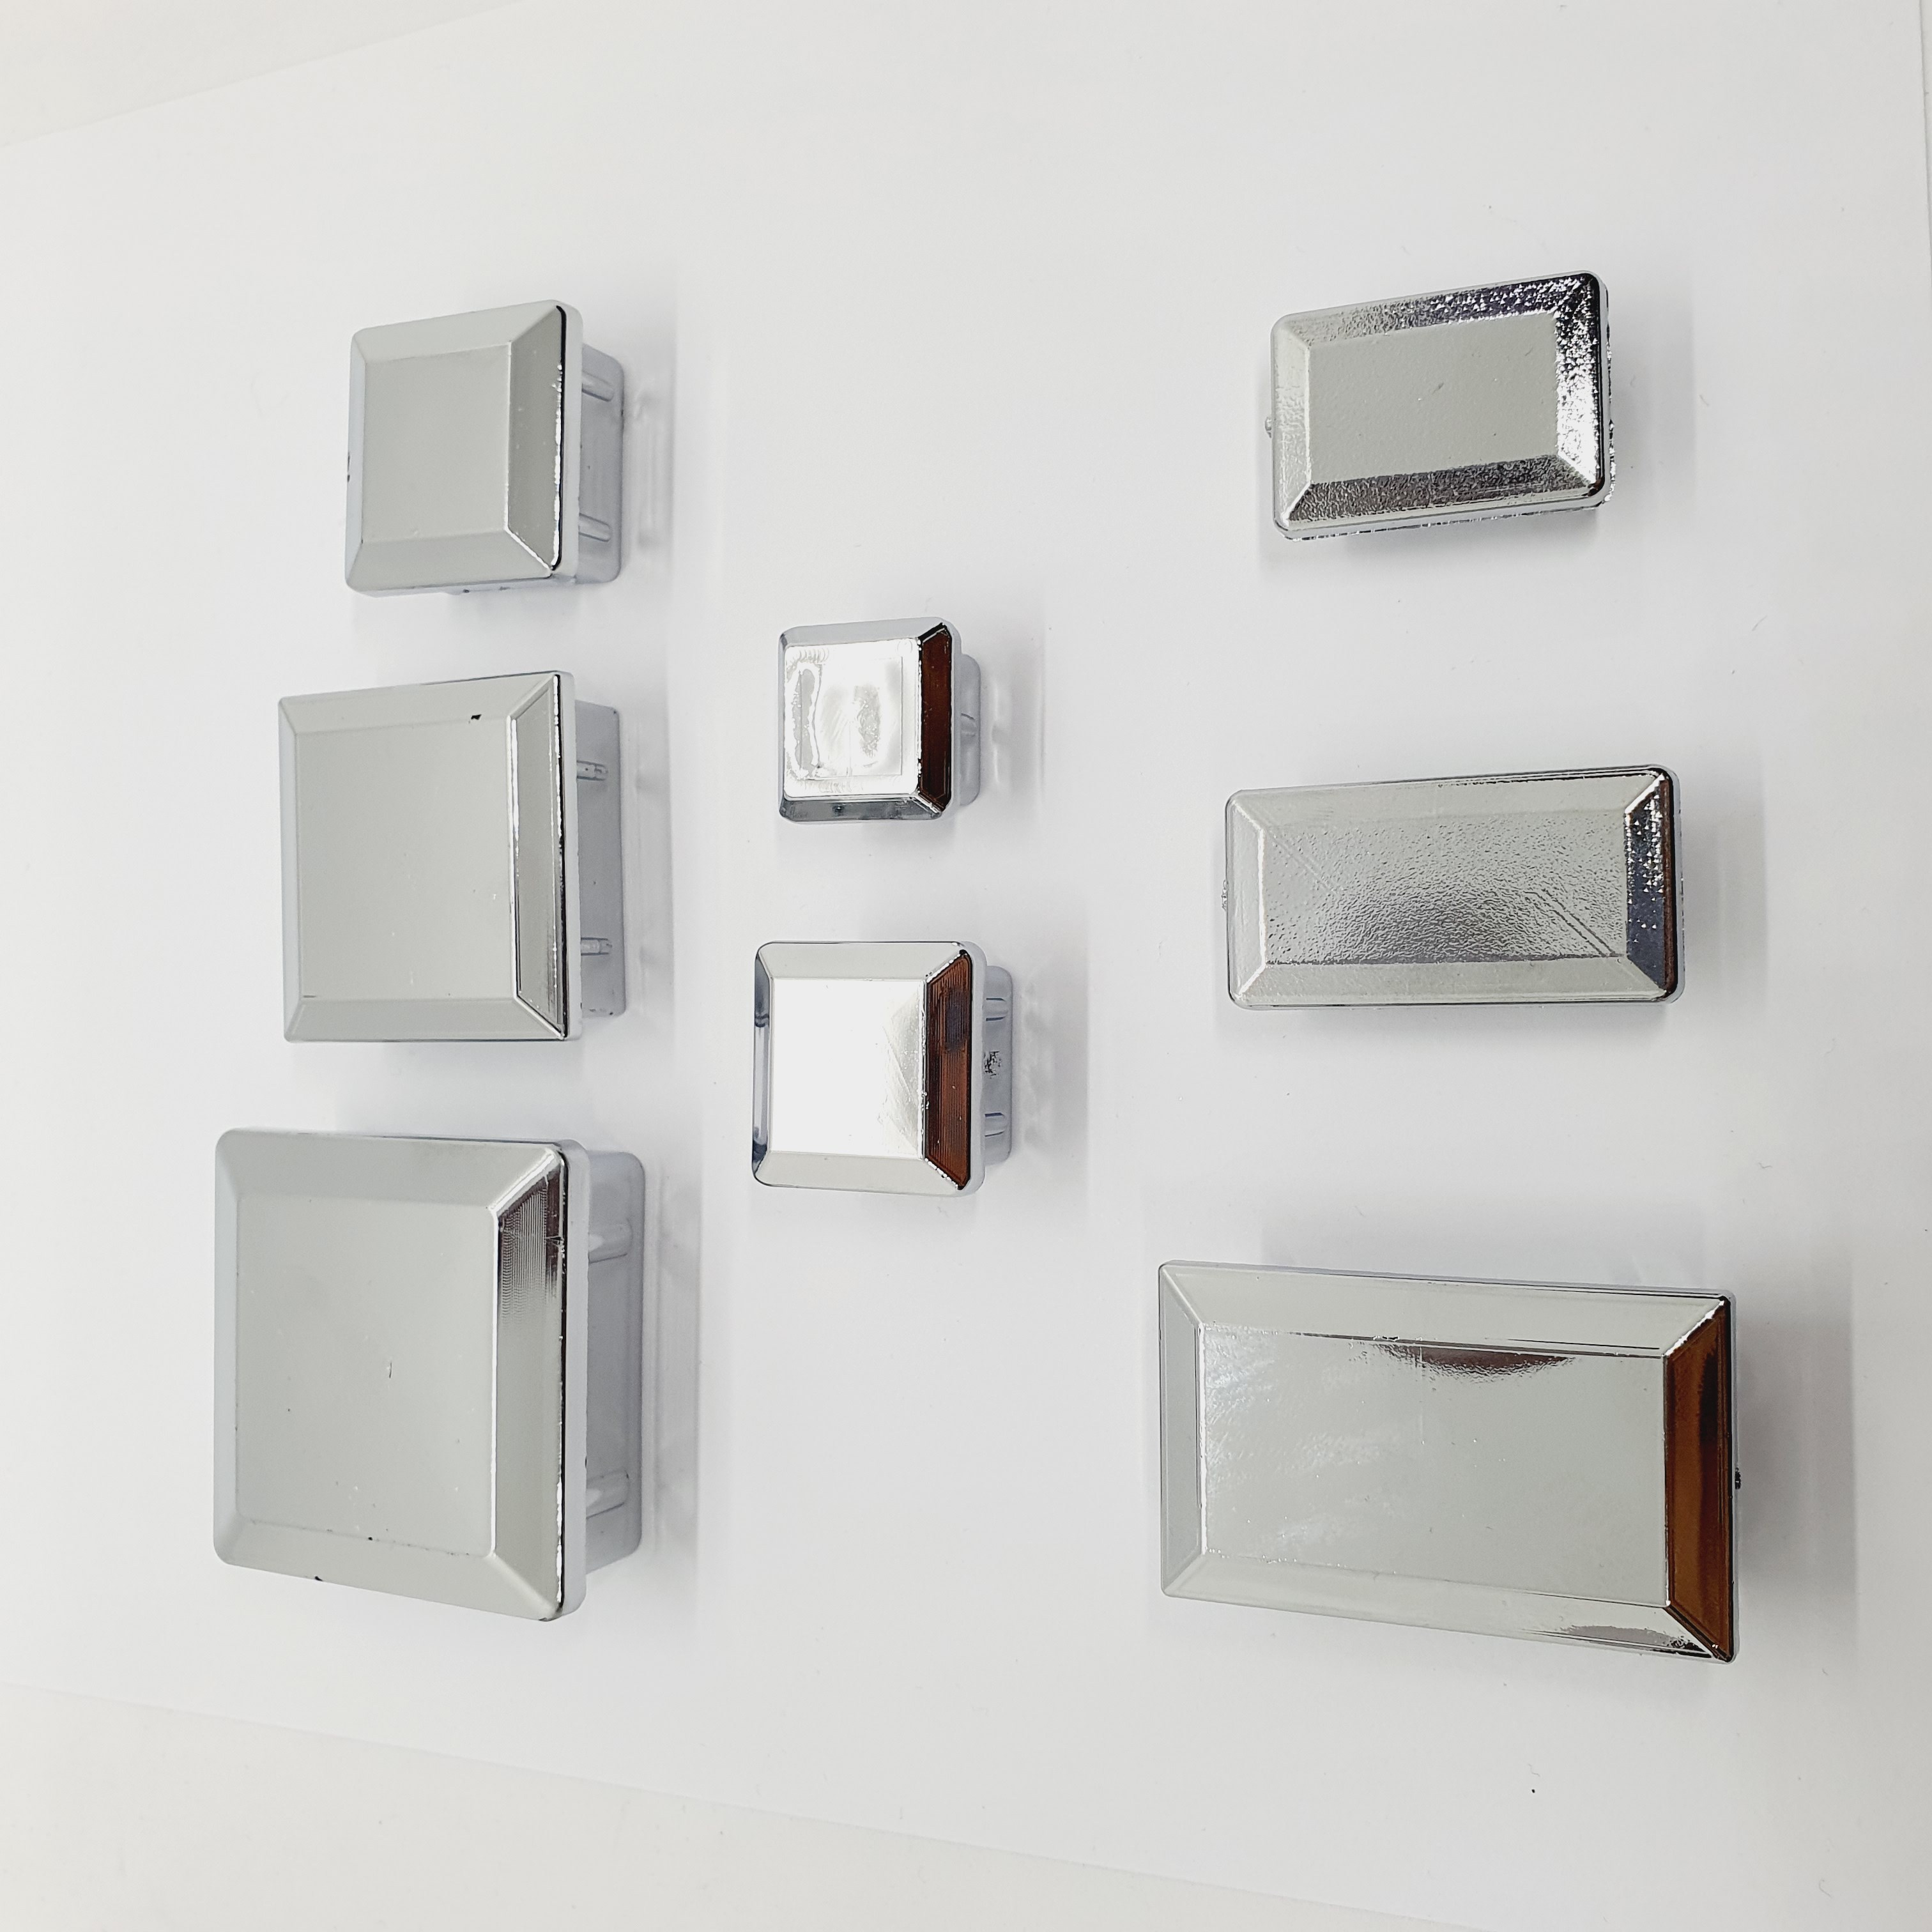 PVC 사각캡 고급 은색 각파이프 마감캡, 1개, 30*30 (POP 1495951433)